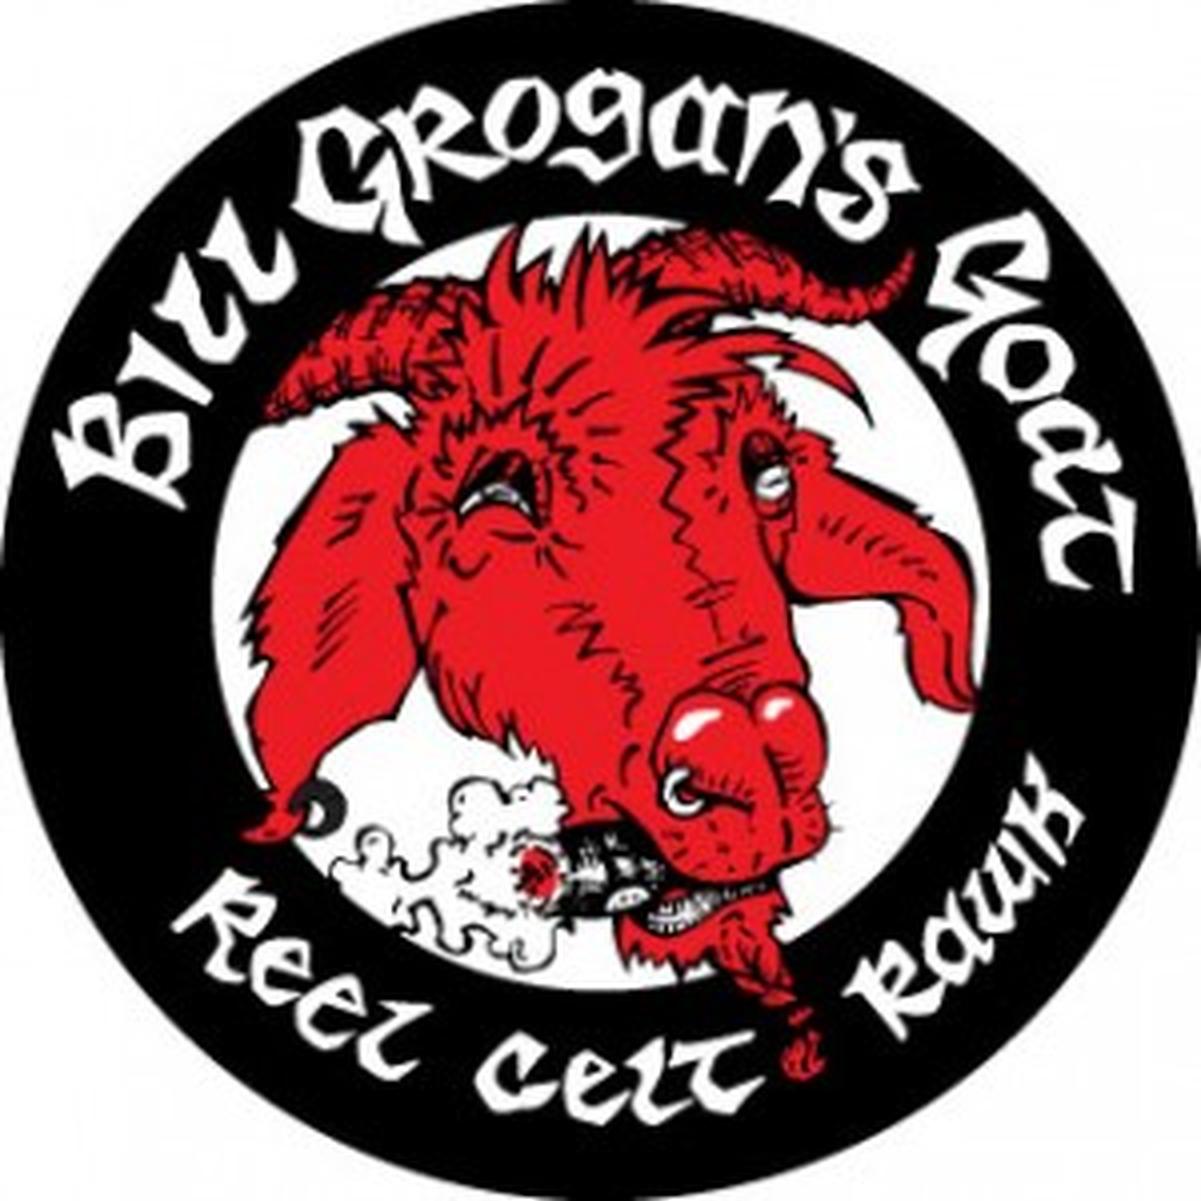 Bill Grogan's Goat wiki, Bill Grogan's Goat review, Bill Grogan's Goat history, Bill Grogan's Goat news